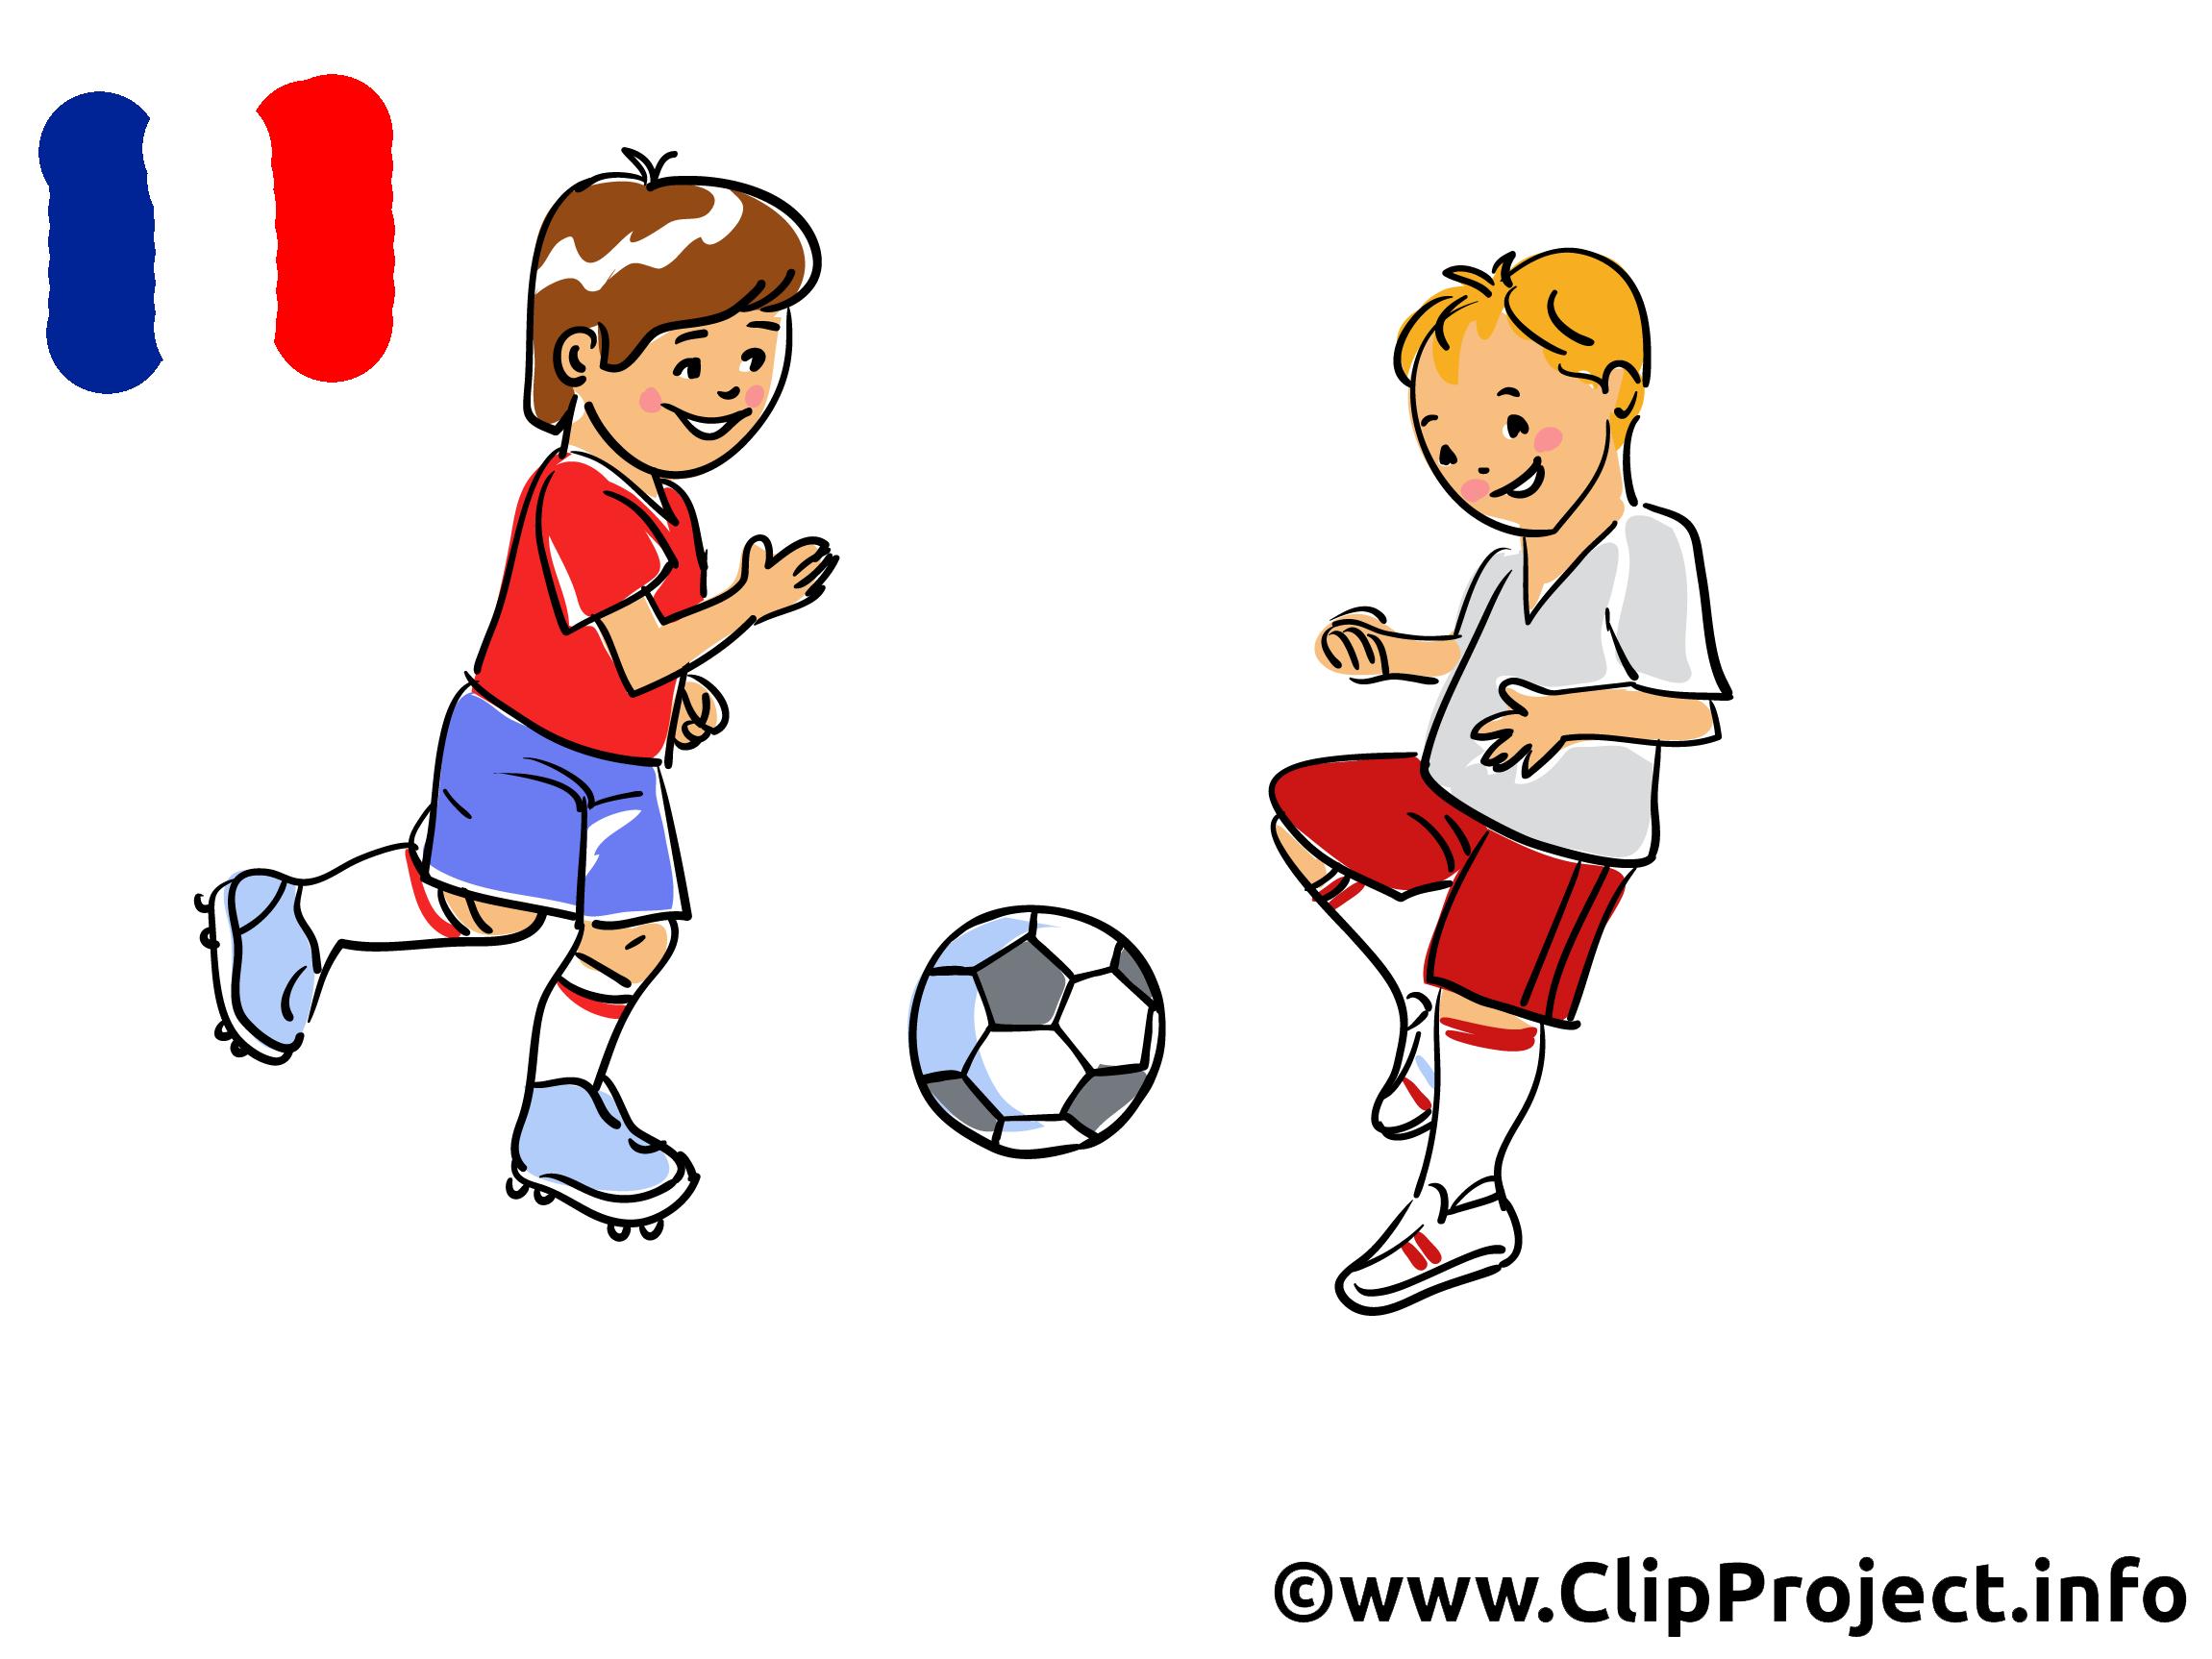 Footballeur clip art image free